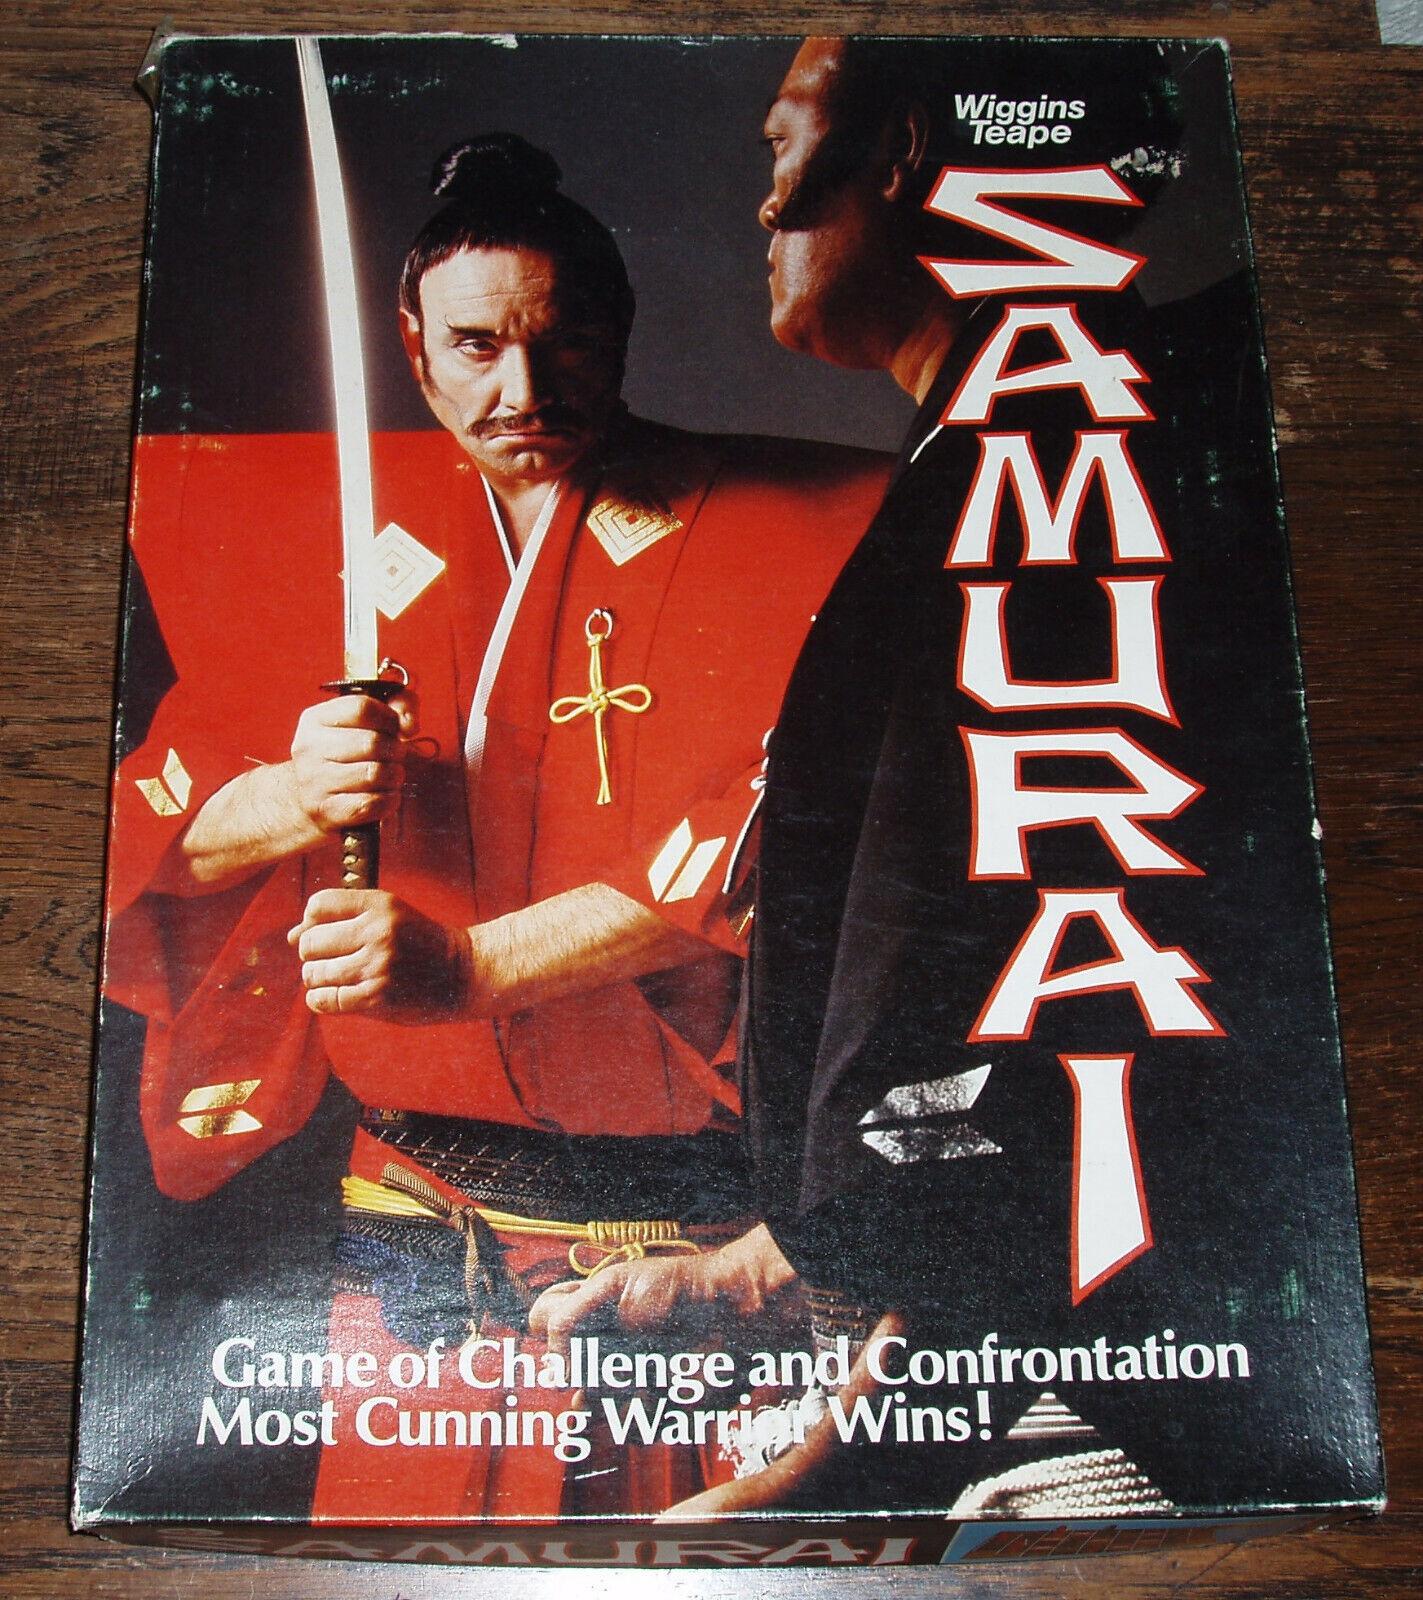 Samurai - strategy game